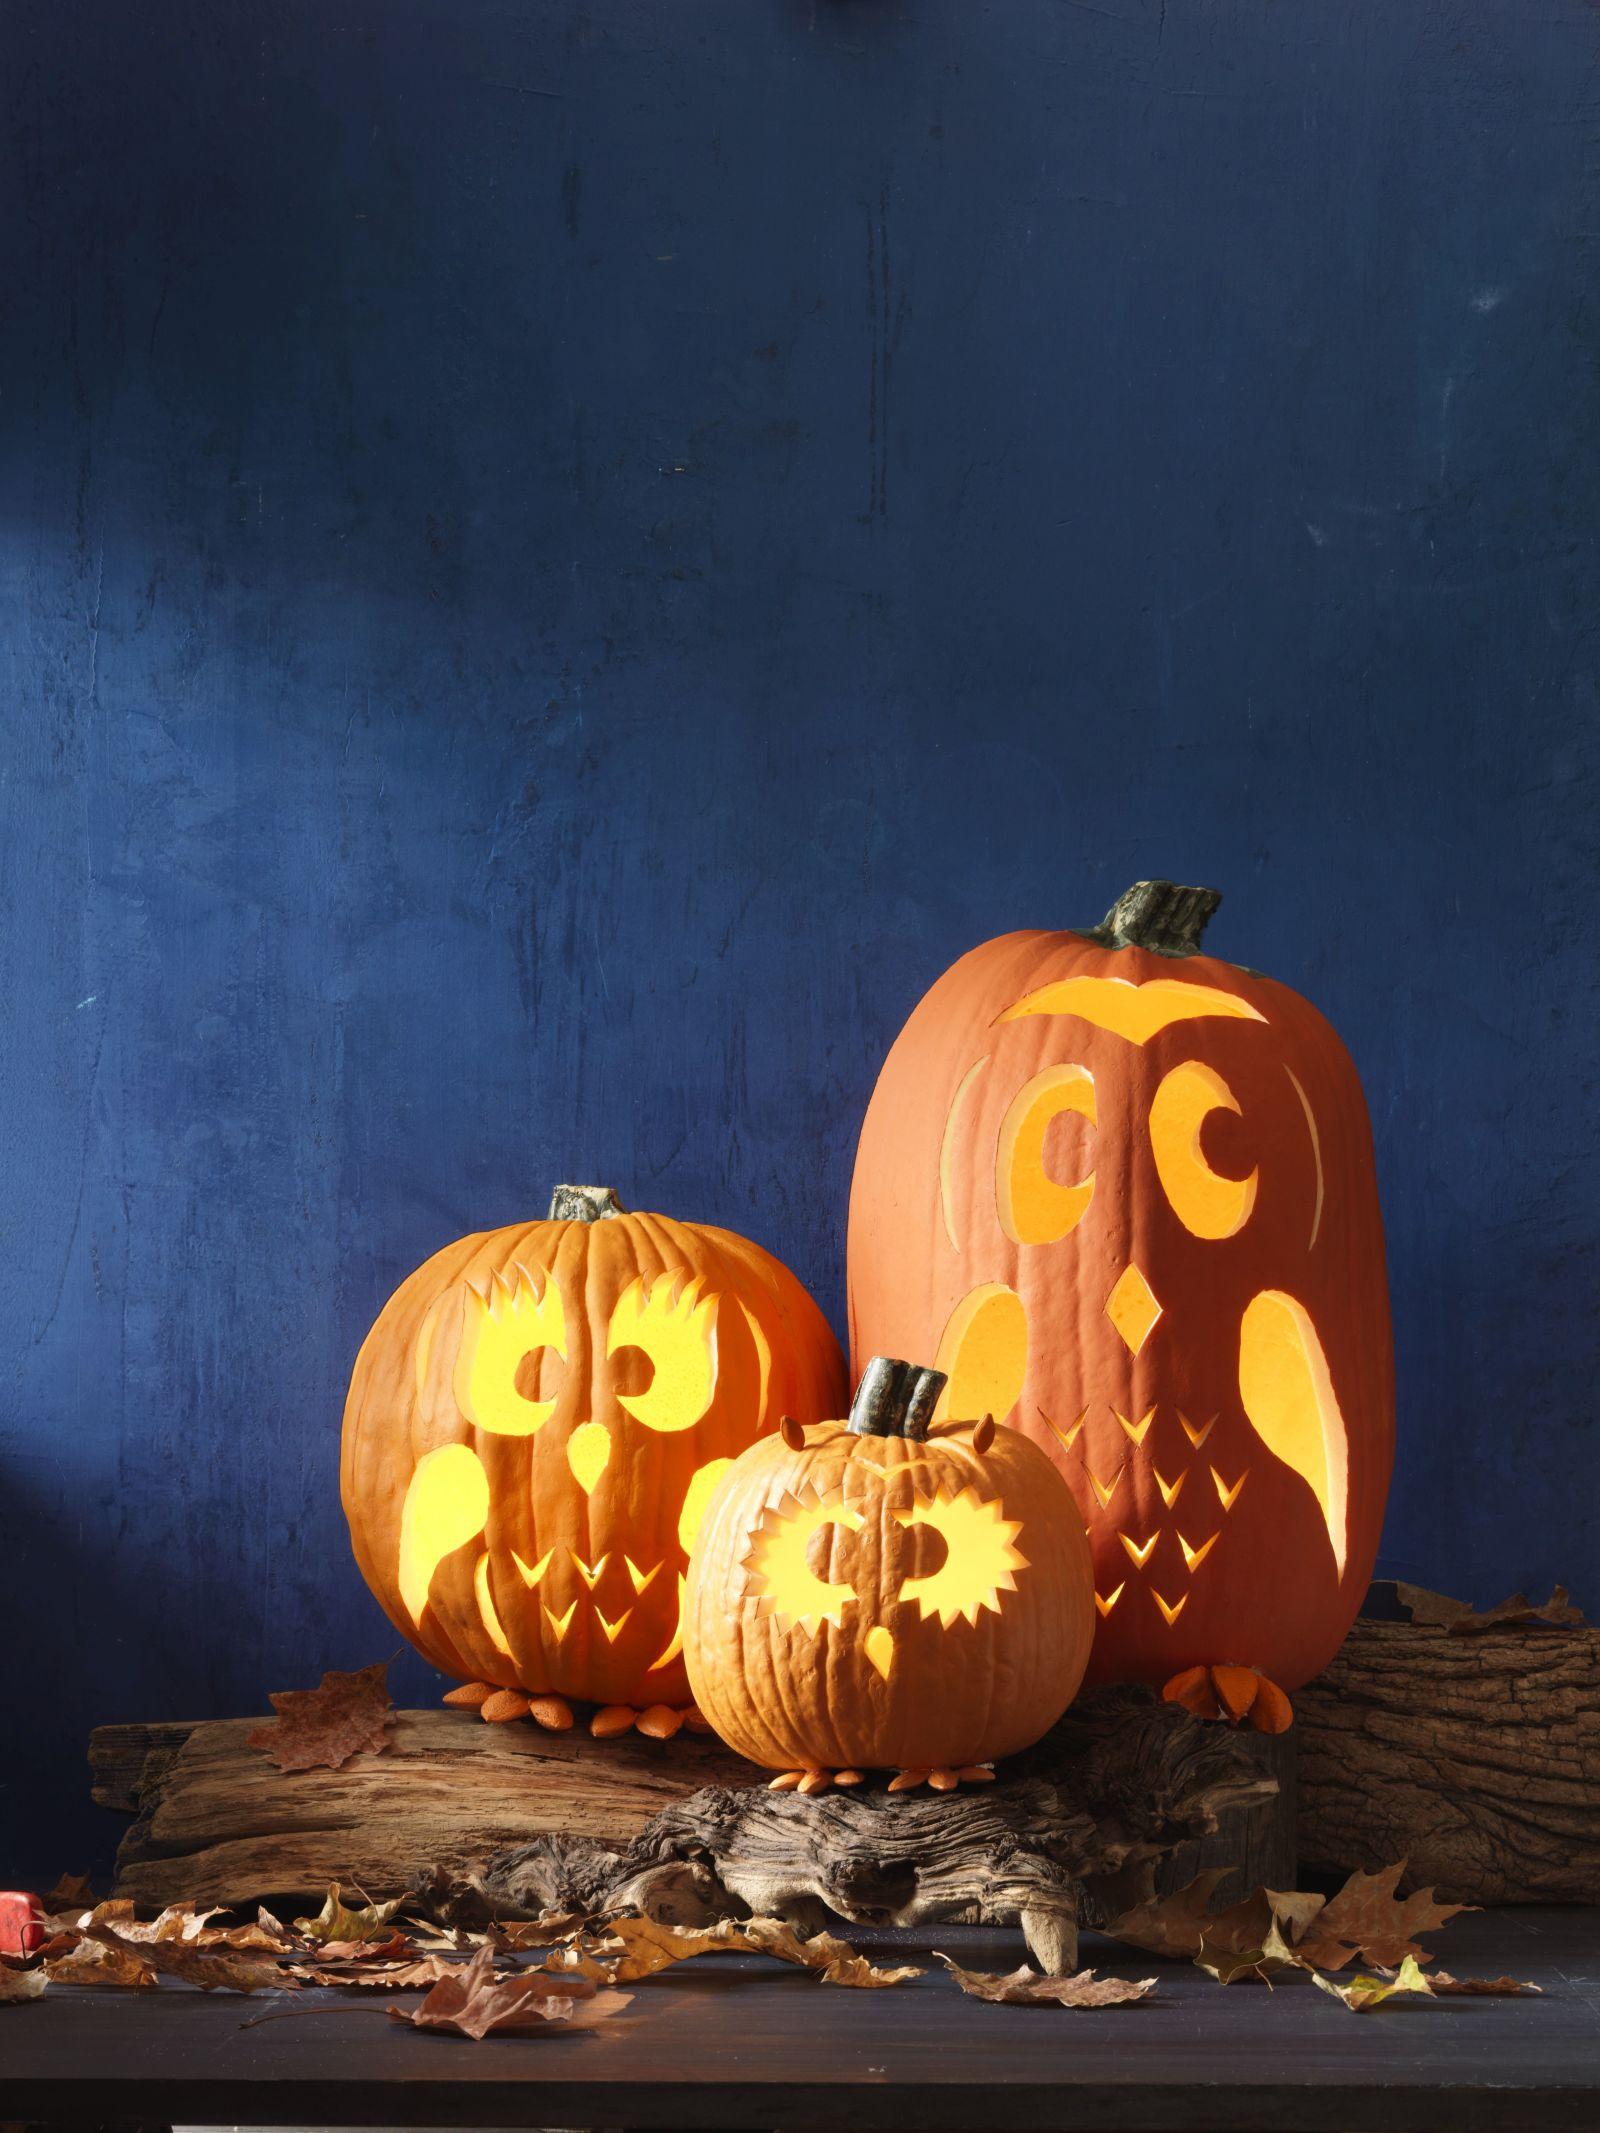 30 Easy Pumpkin Carving Ideas for Halloween 2017 - Cool Pumpkin ...